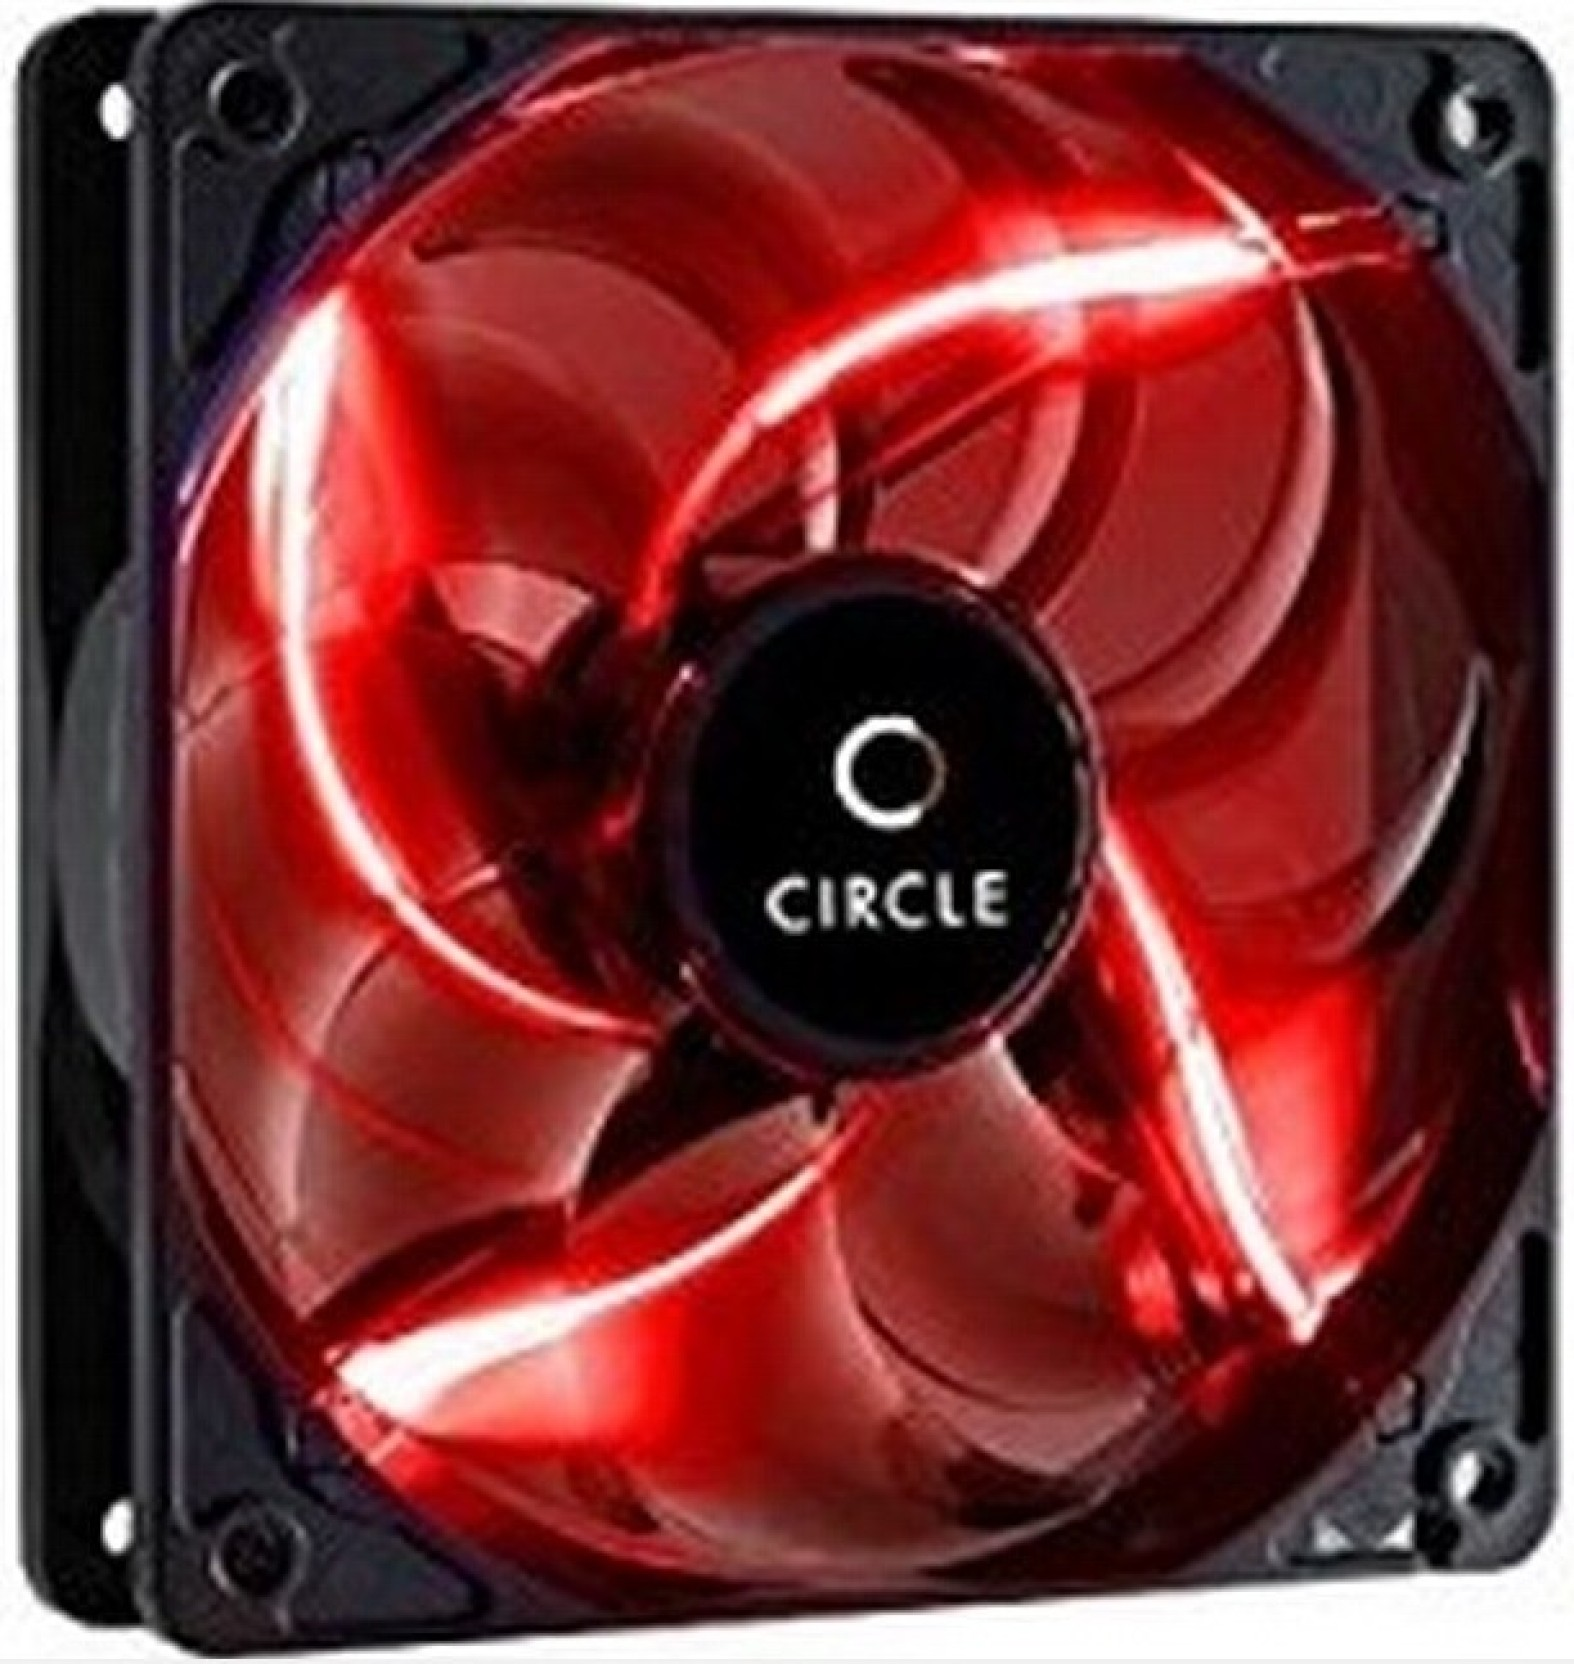 Circle Led Fan Cg 12 Red Cooler Deepcool Xfan 12cm Casing Black Add To Cart